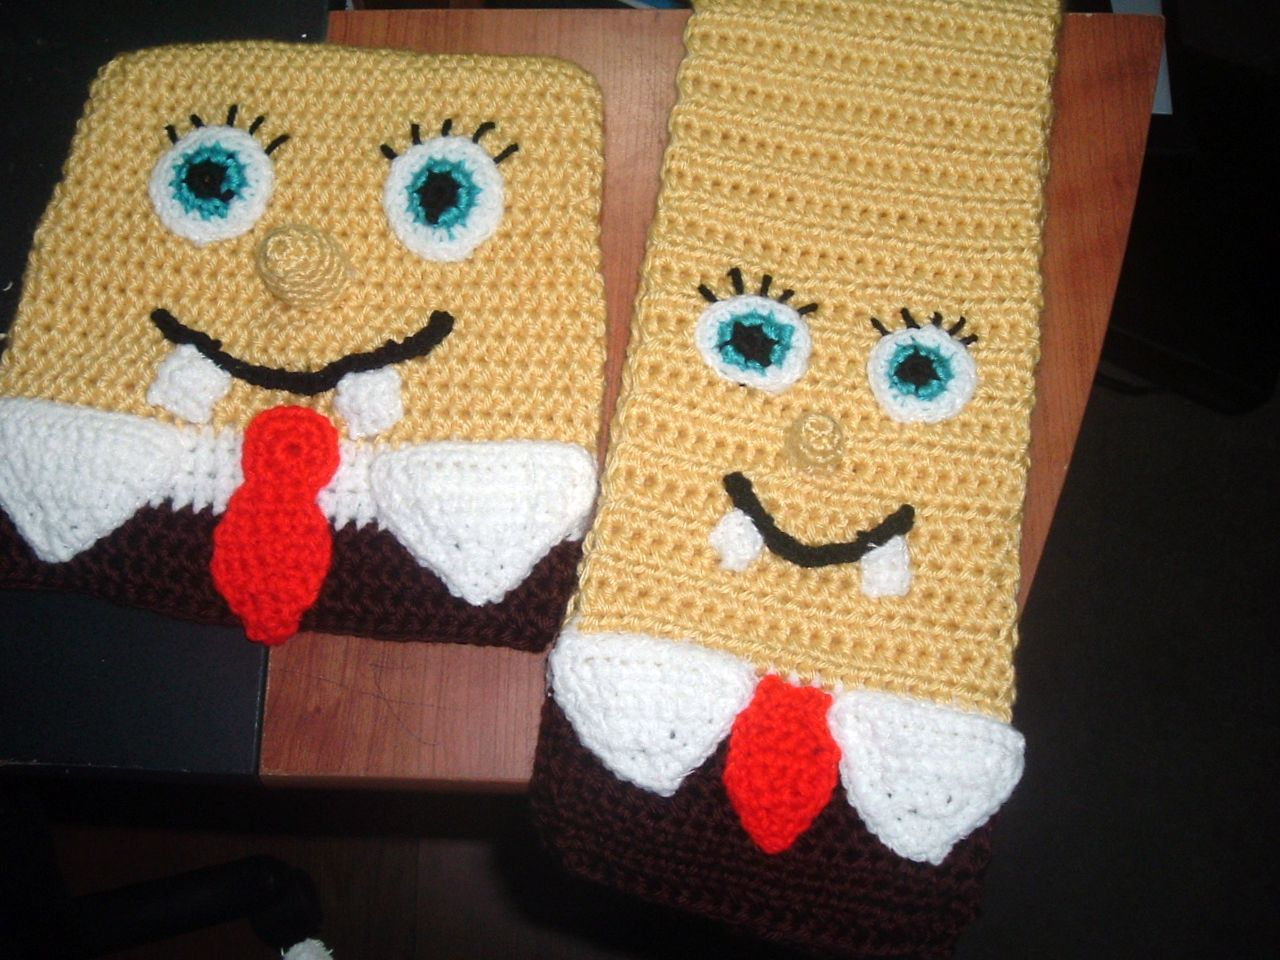 Free Crochet Pattern Spongebob Hat : Nanette Crochet: Spongebob Square Pants set